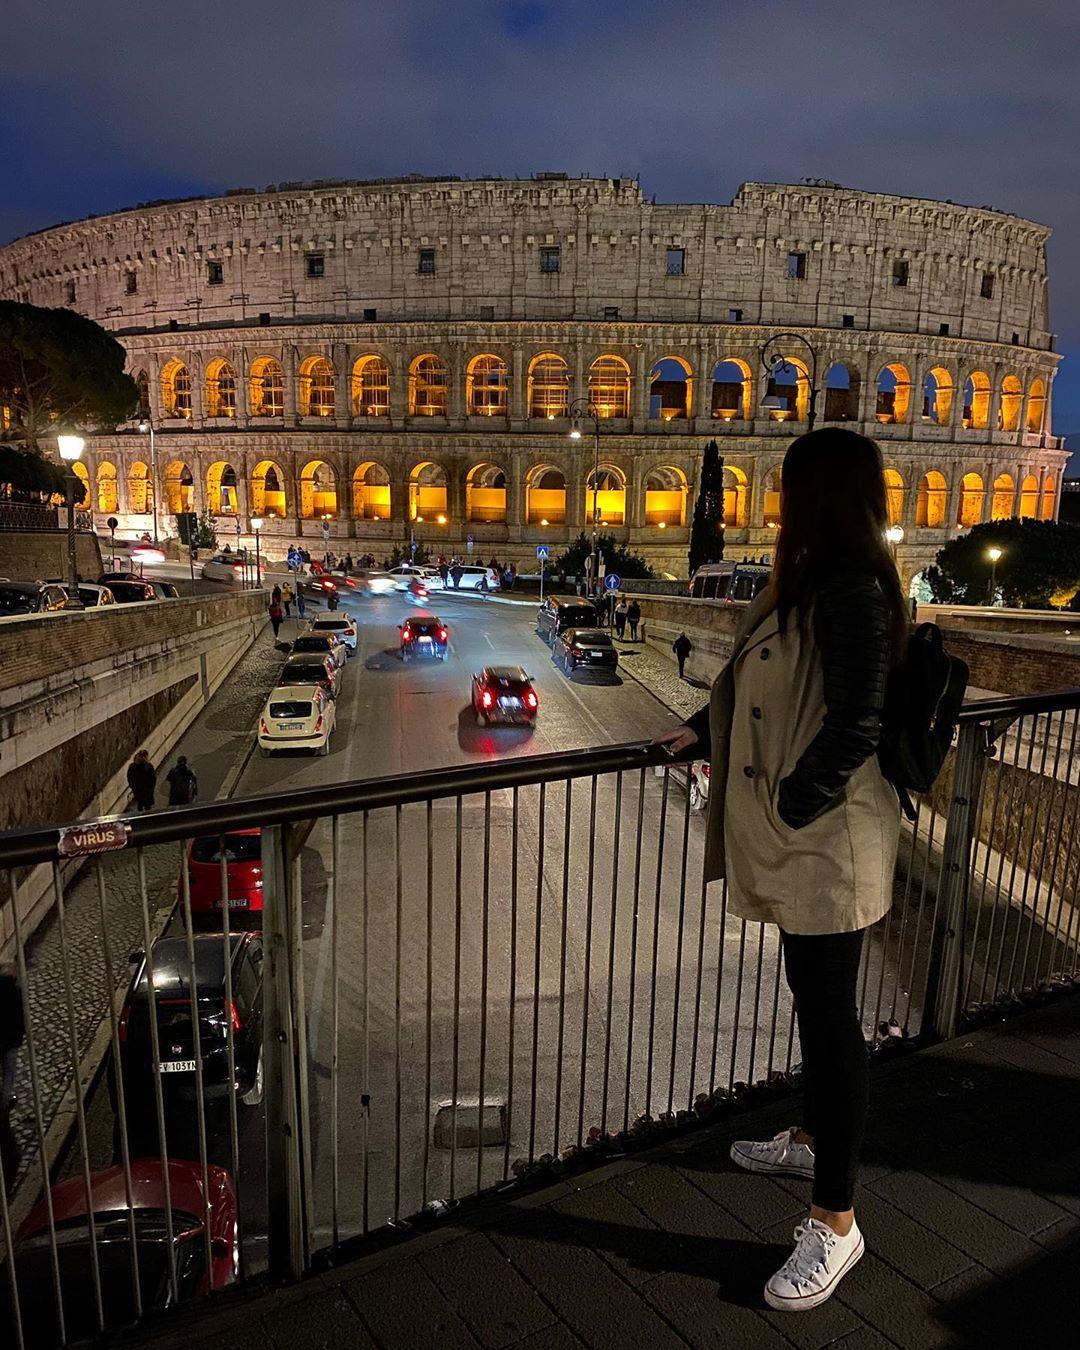 TOP 15 Tempat Wisata Italia Dengan Sejarah Yang Mengagumkan 1